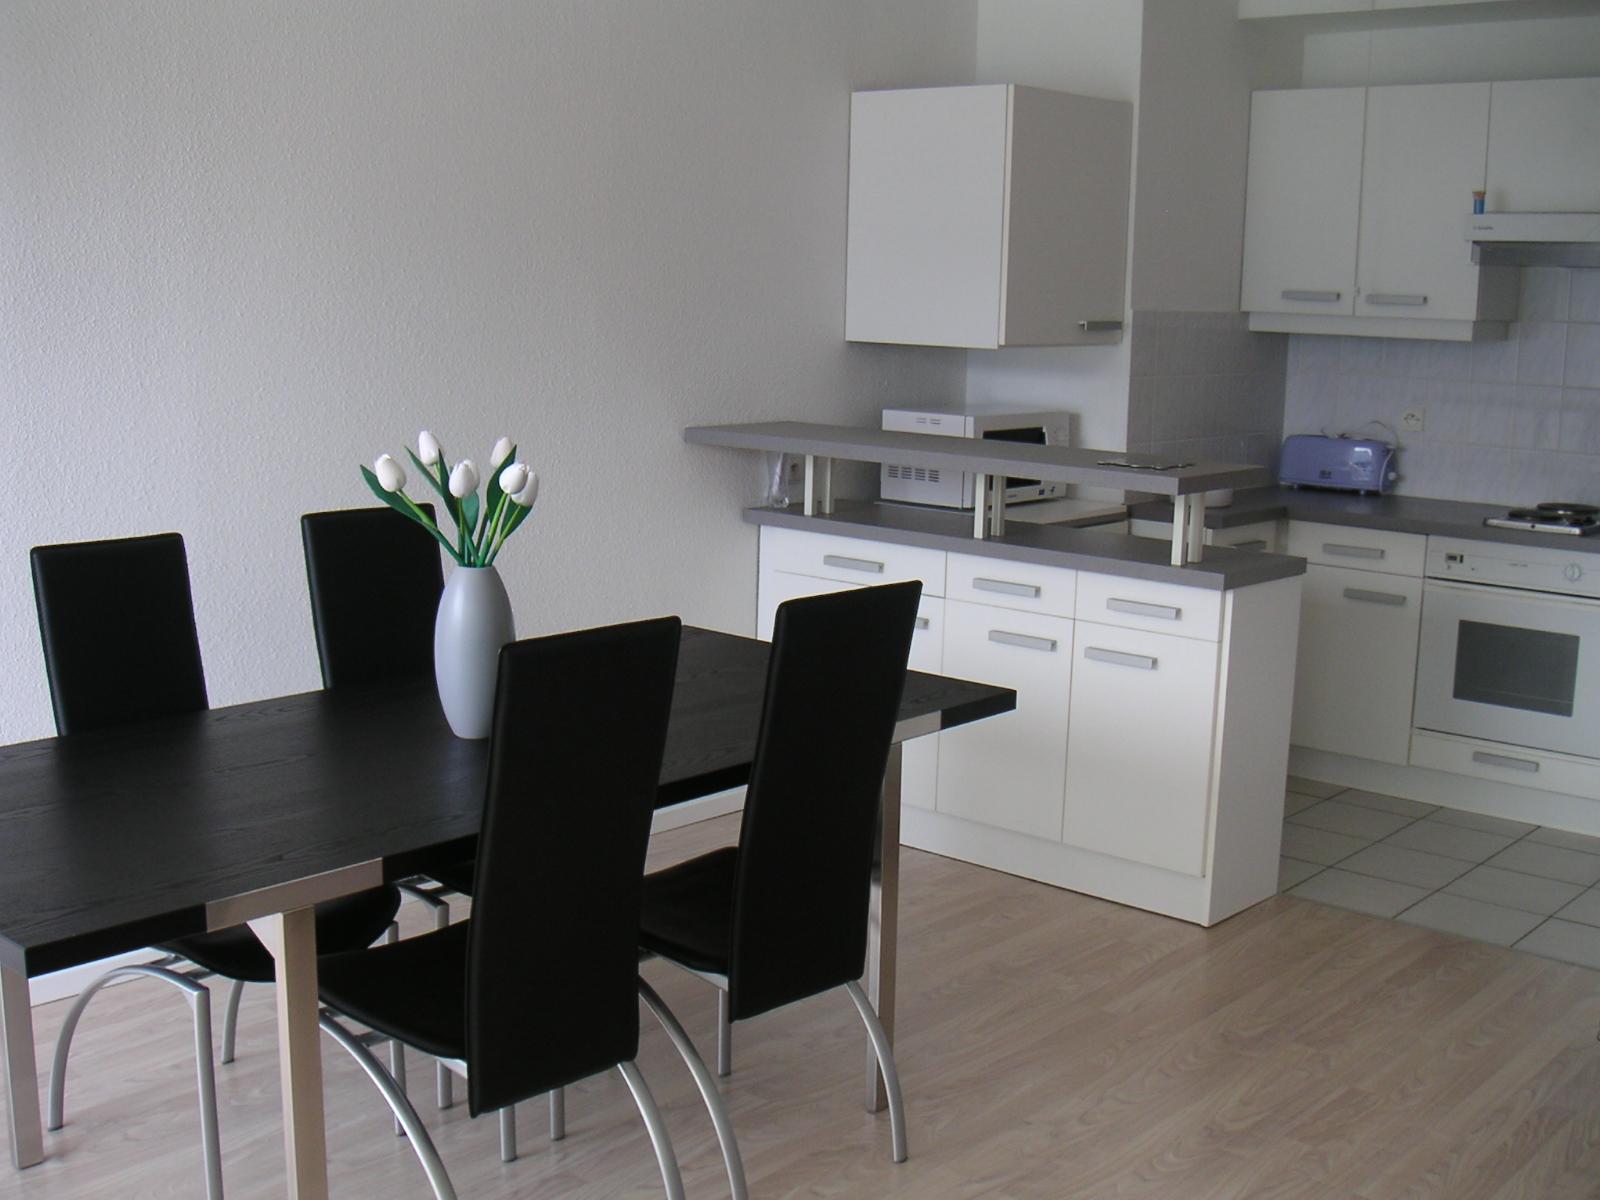 Location appartement meuble tresserve - Location studio meuble lorient ...